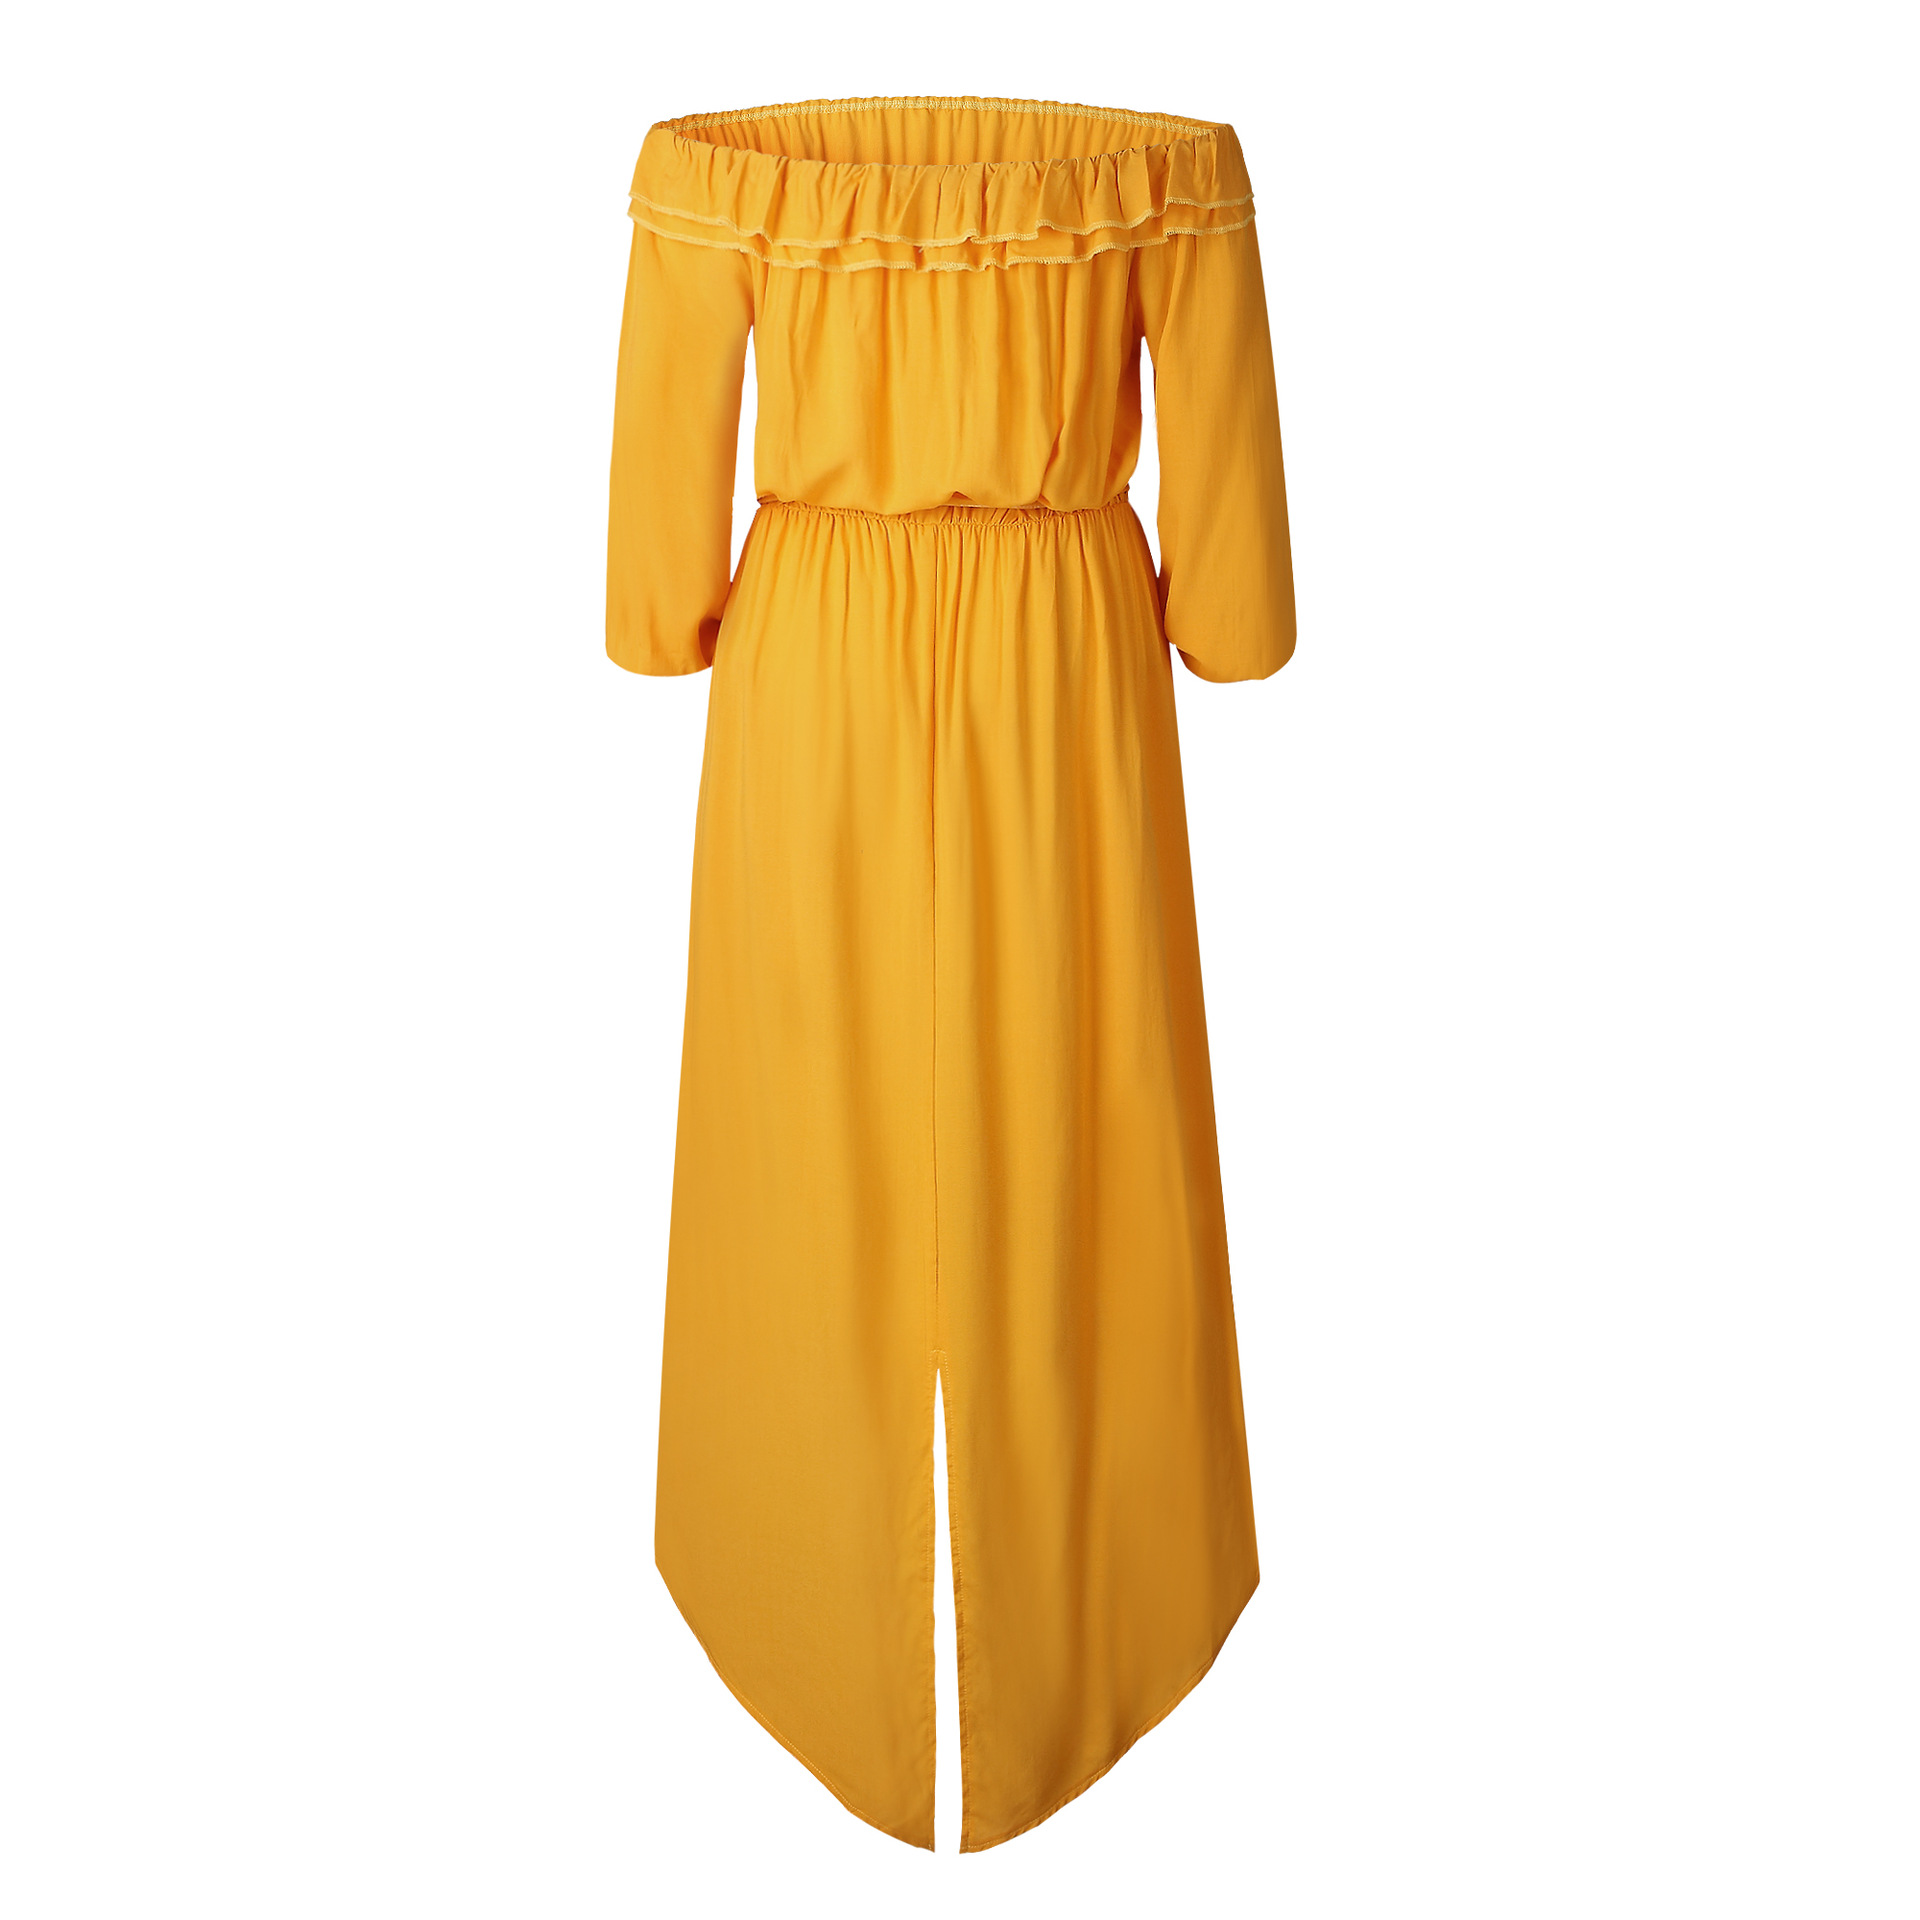 Womens Dress Solide Sleeveless Party Sommer Strandkleid Lose Feste Casual Dress